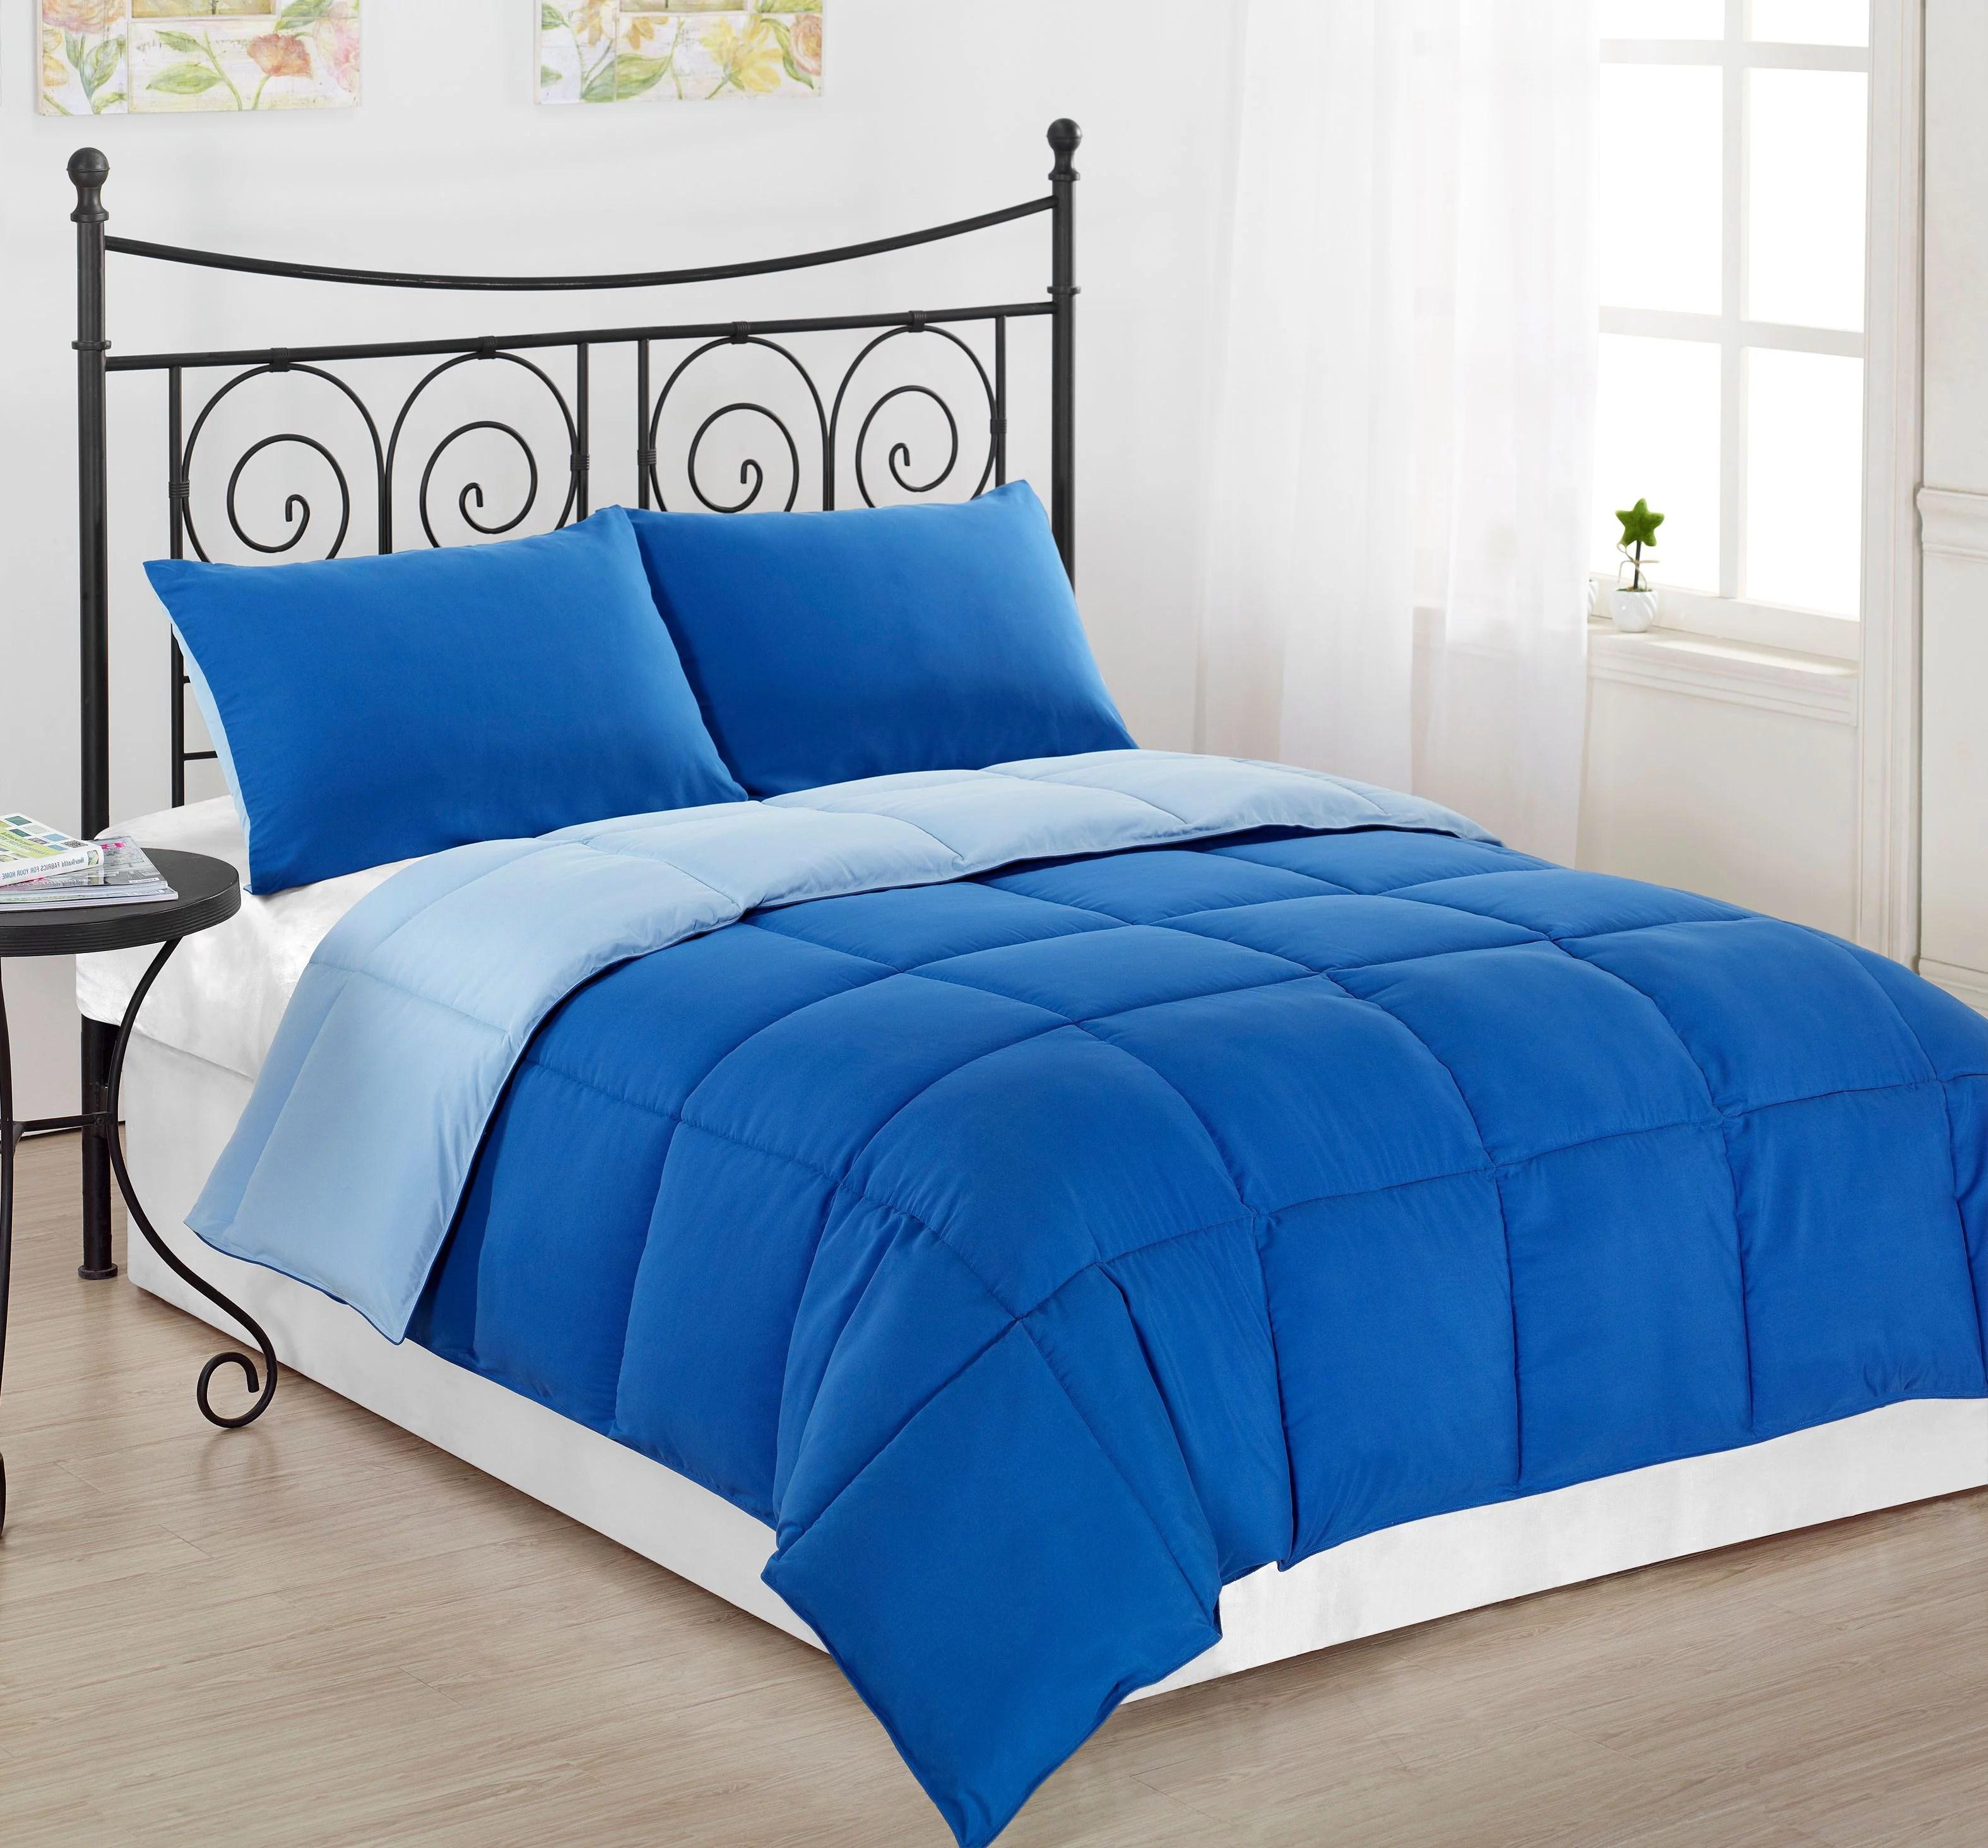 cozybeddings reversible collection 2pc down alternative comforter set blue light blue king walmart com